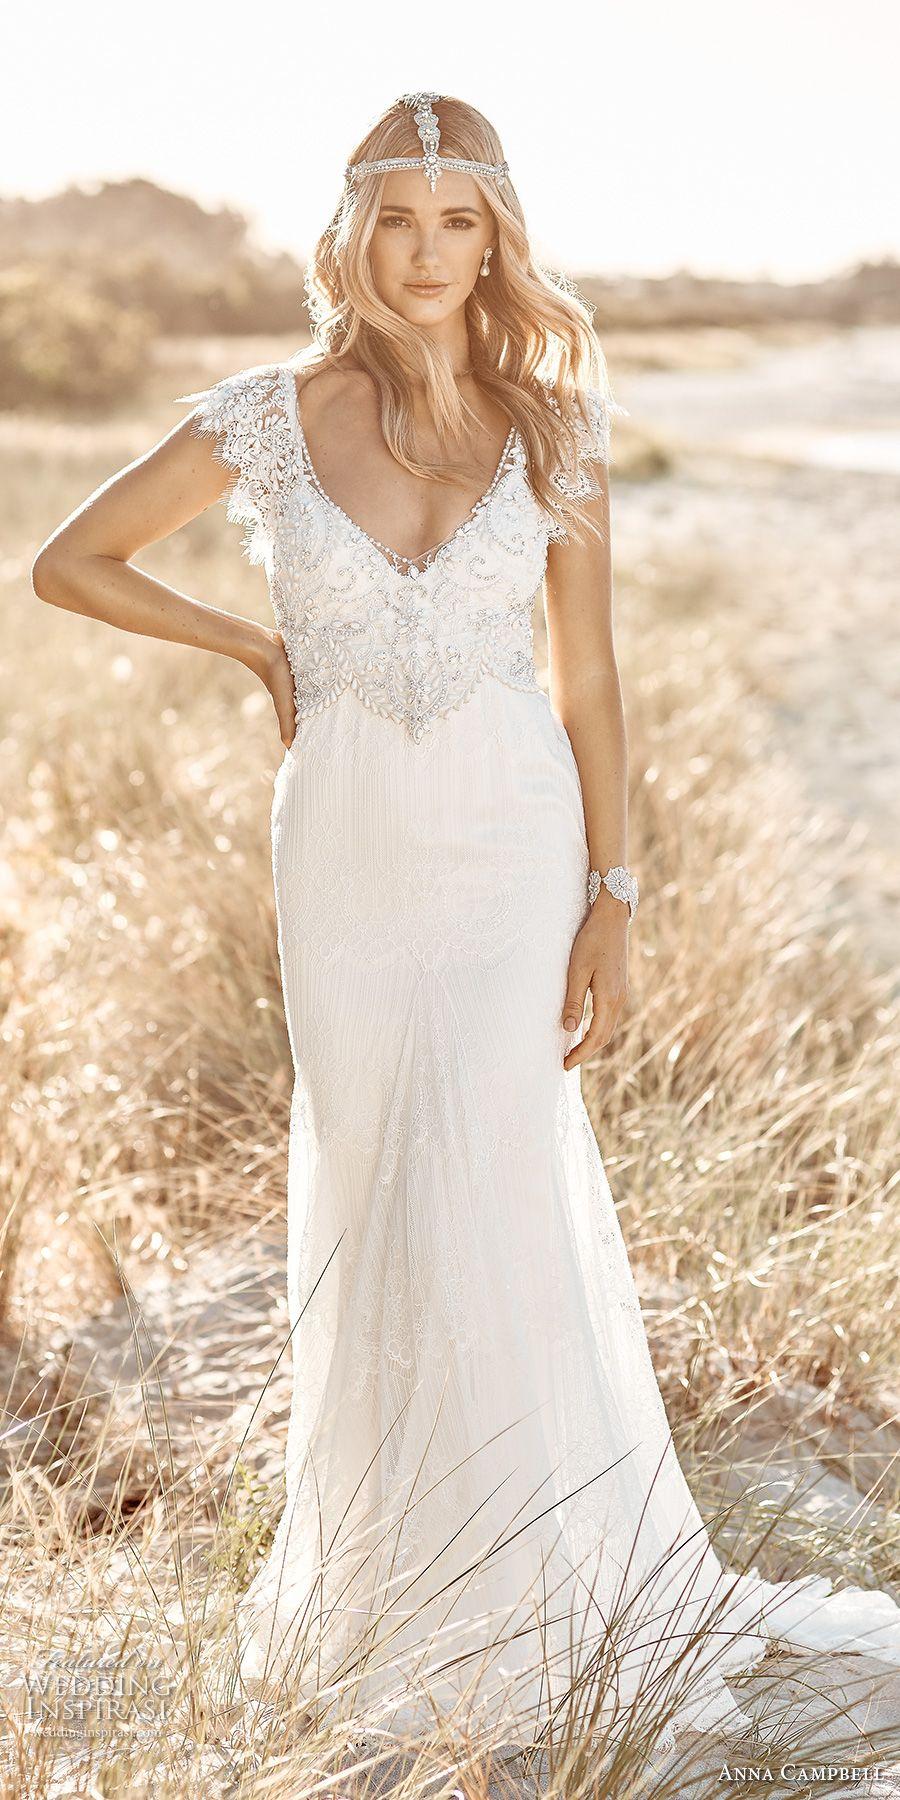 Pin by yuenee teng on wedding dresses pinterest wedding dress